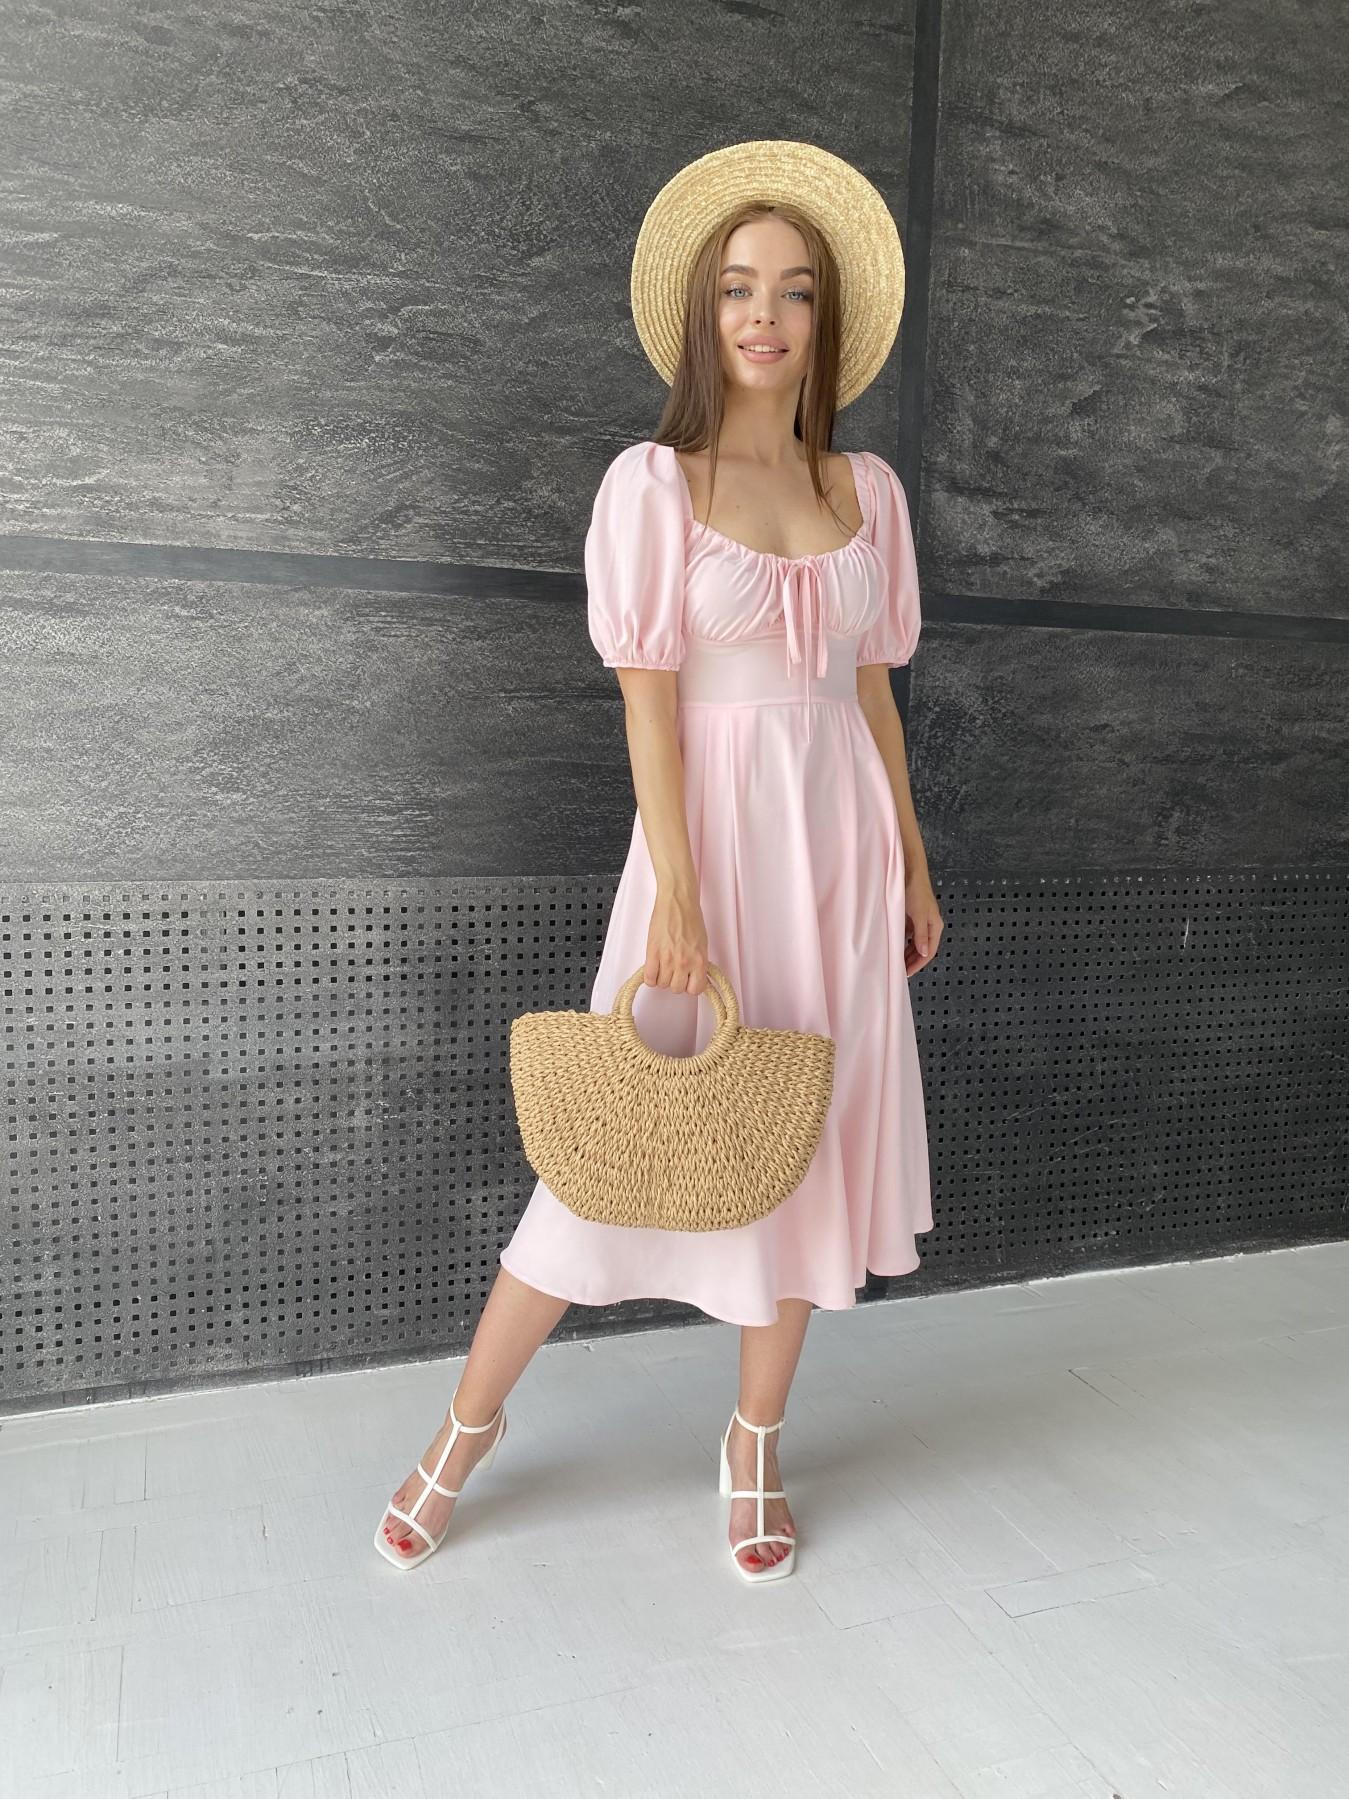 Кисес Миди платье  софт 11540 АРТ. 48193 Цвет: Пудра 13 - фото 3, интернет магазин tm-modus.ru